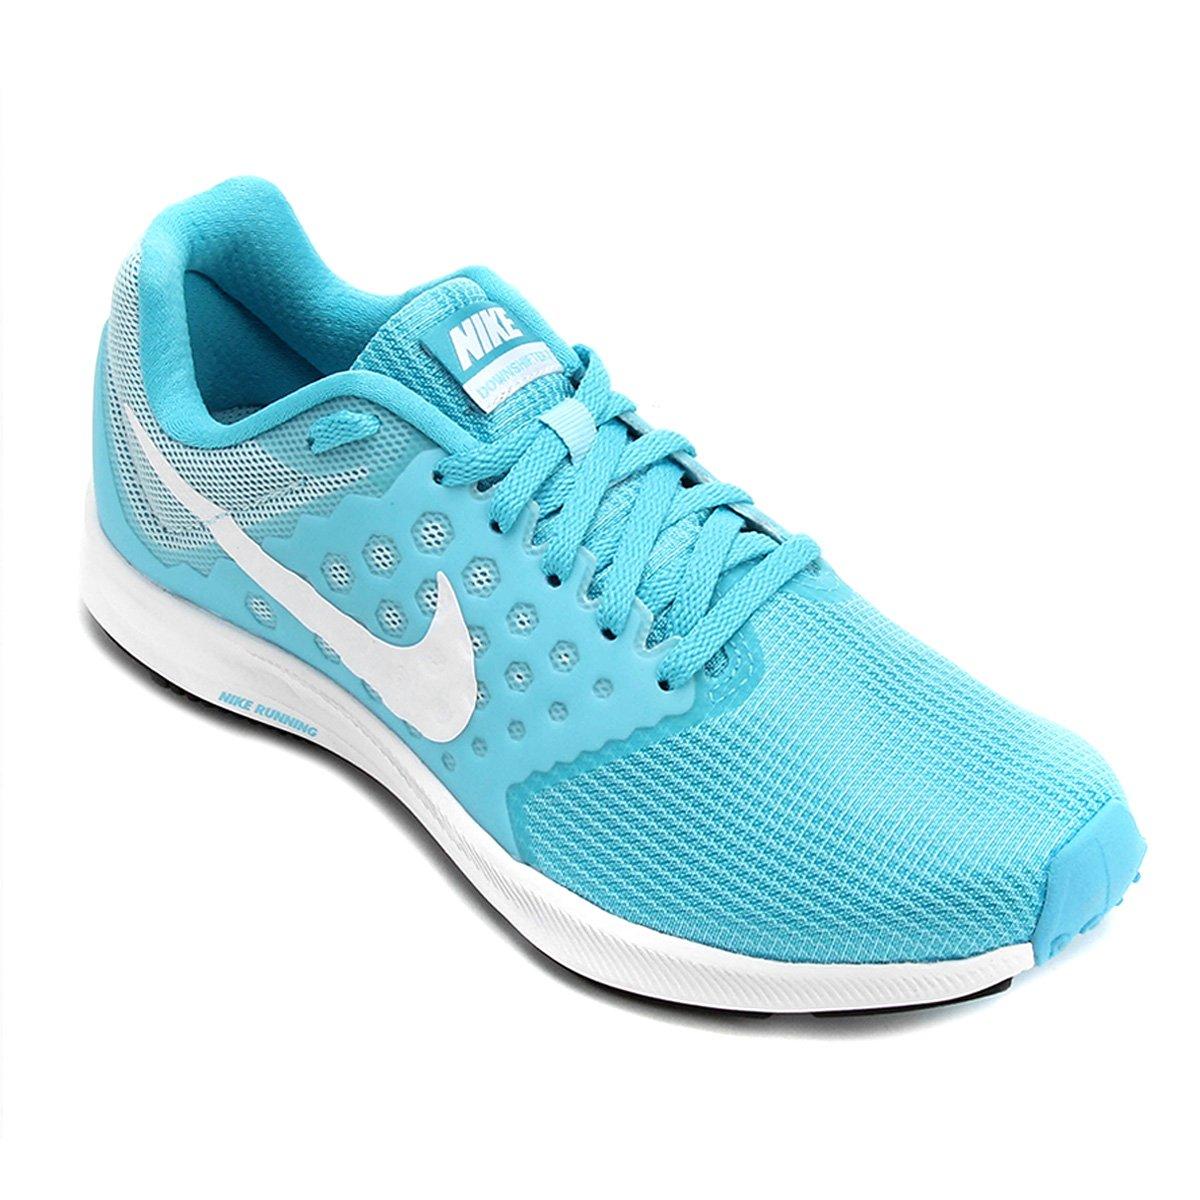 0d25676754 Tênis Nike Downshifter 7 Feminino - Azul e Branco | Loja do Inter